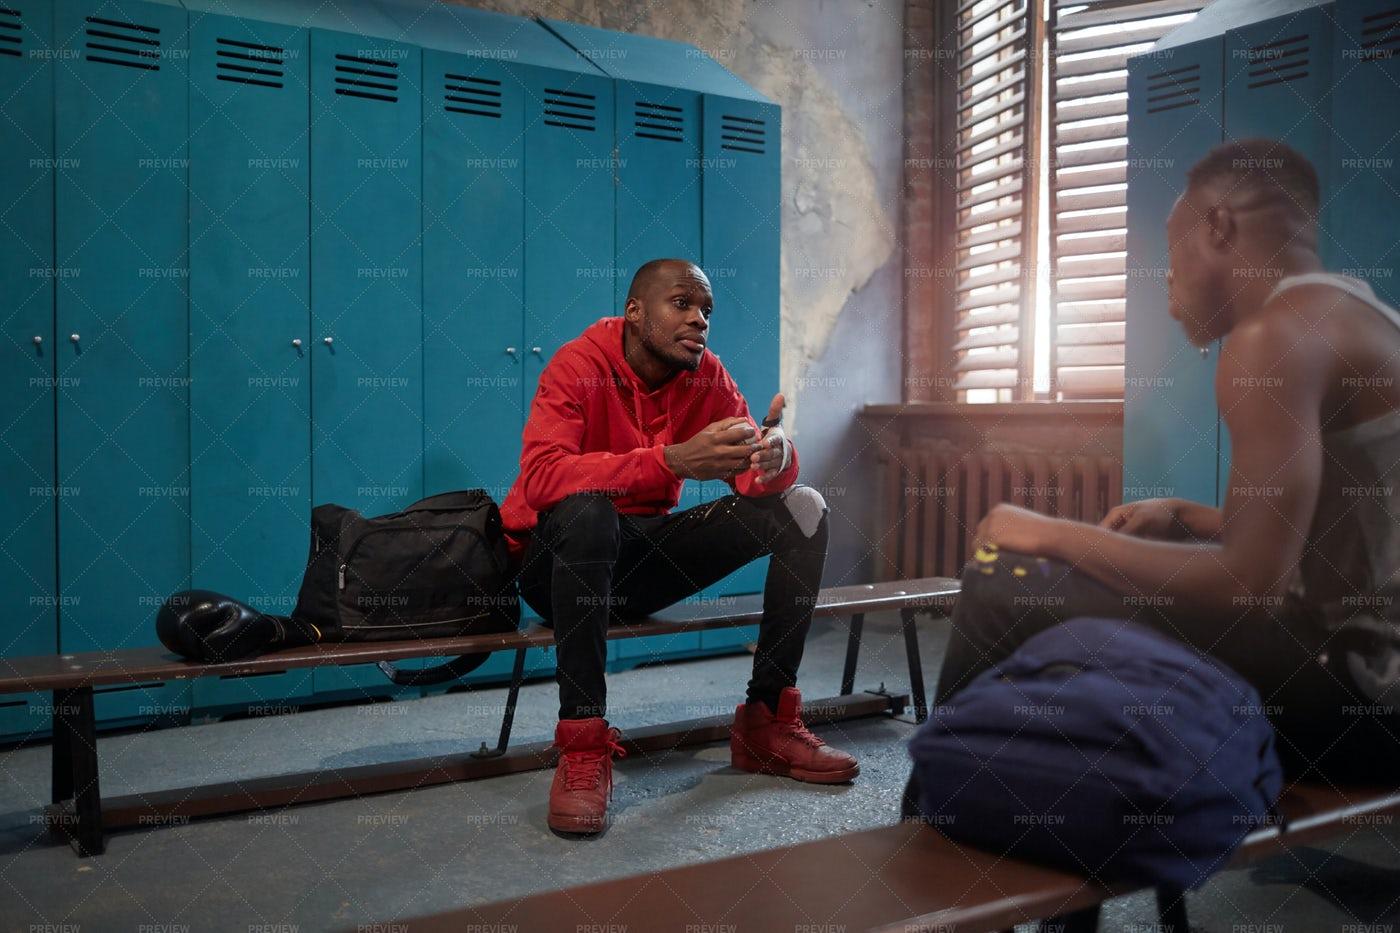 Boxers Talking In Locker Room: Stock Photos